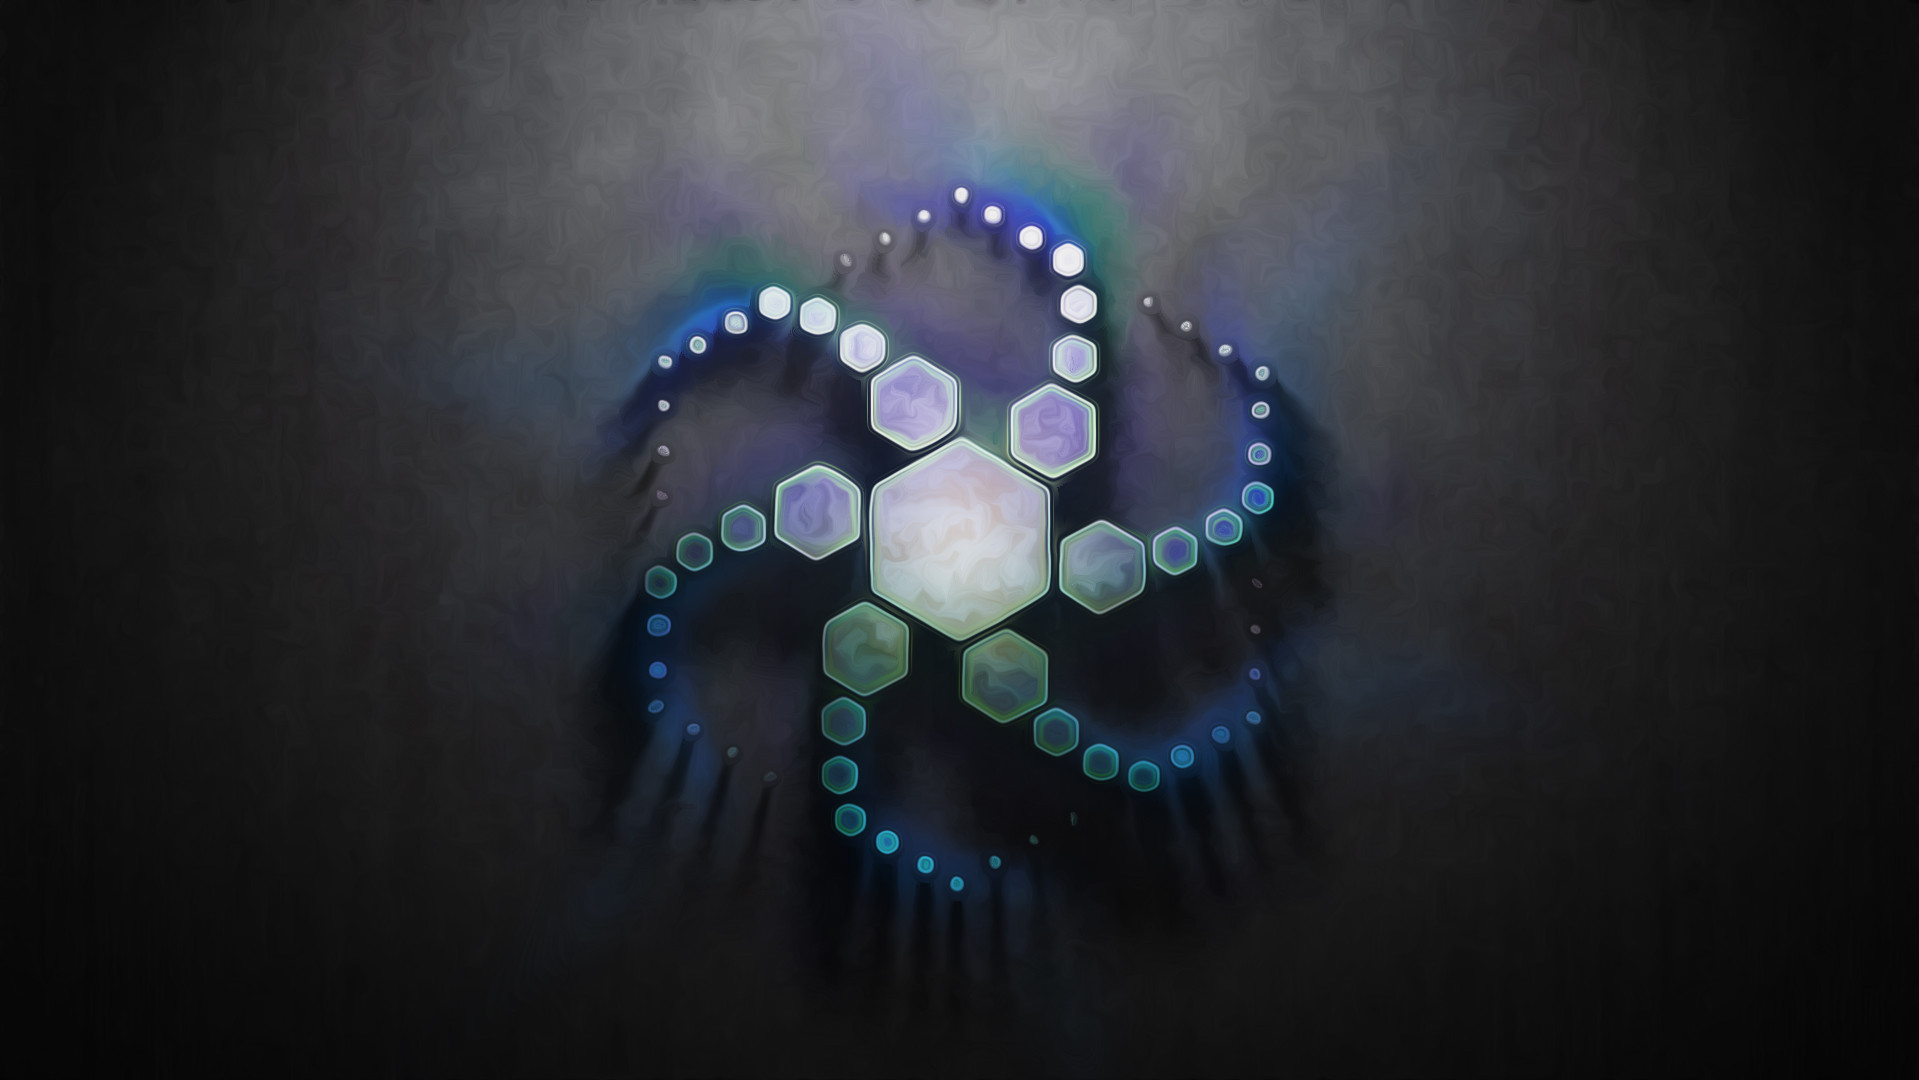 Cephalon-Suda-Blue-%C3%97-Warframe-Syndicate-wallpaper-wp5205084